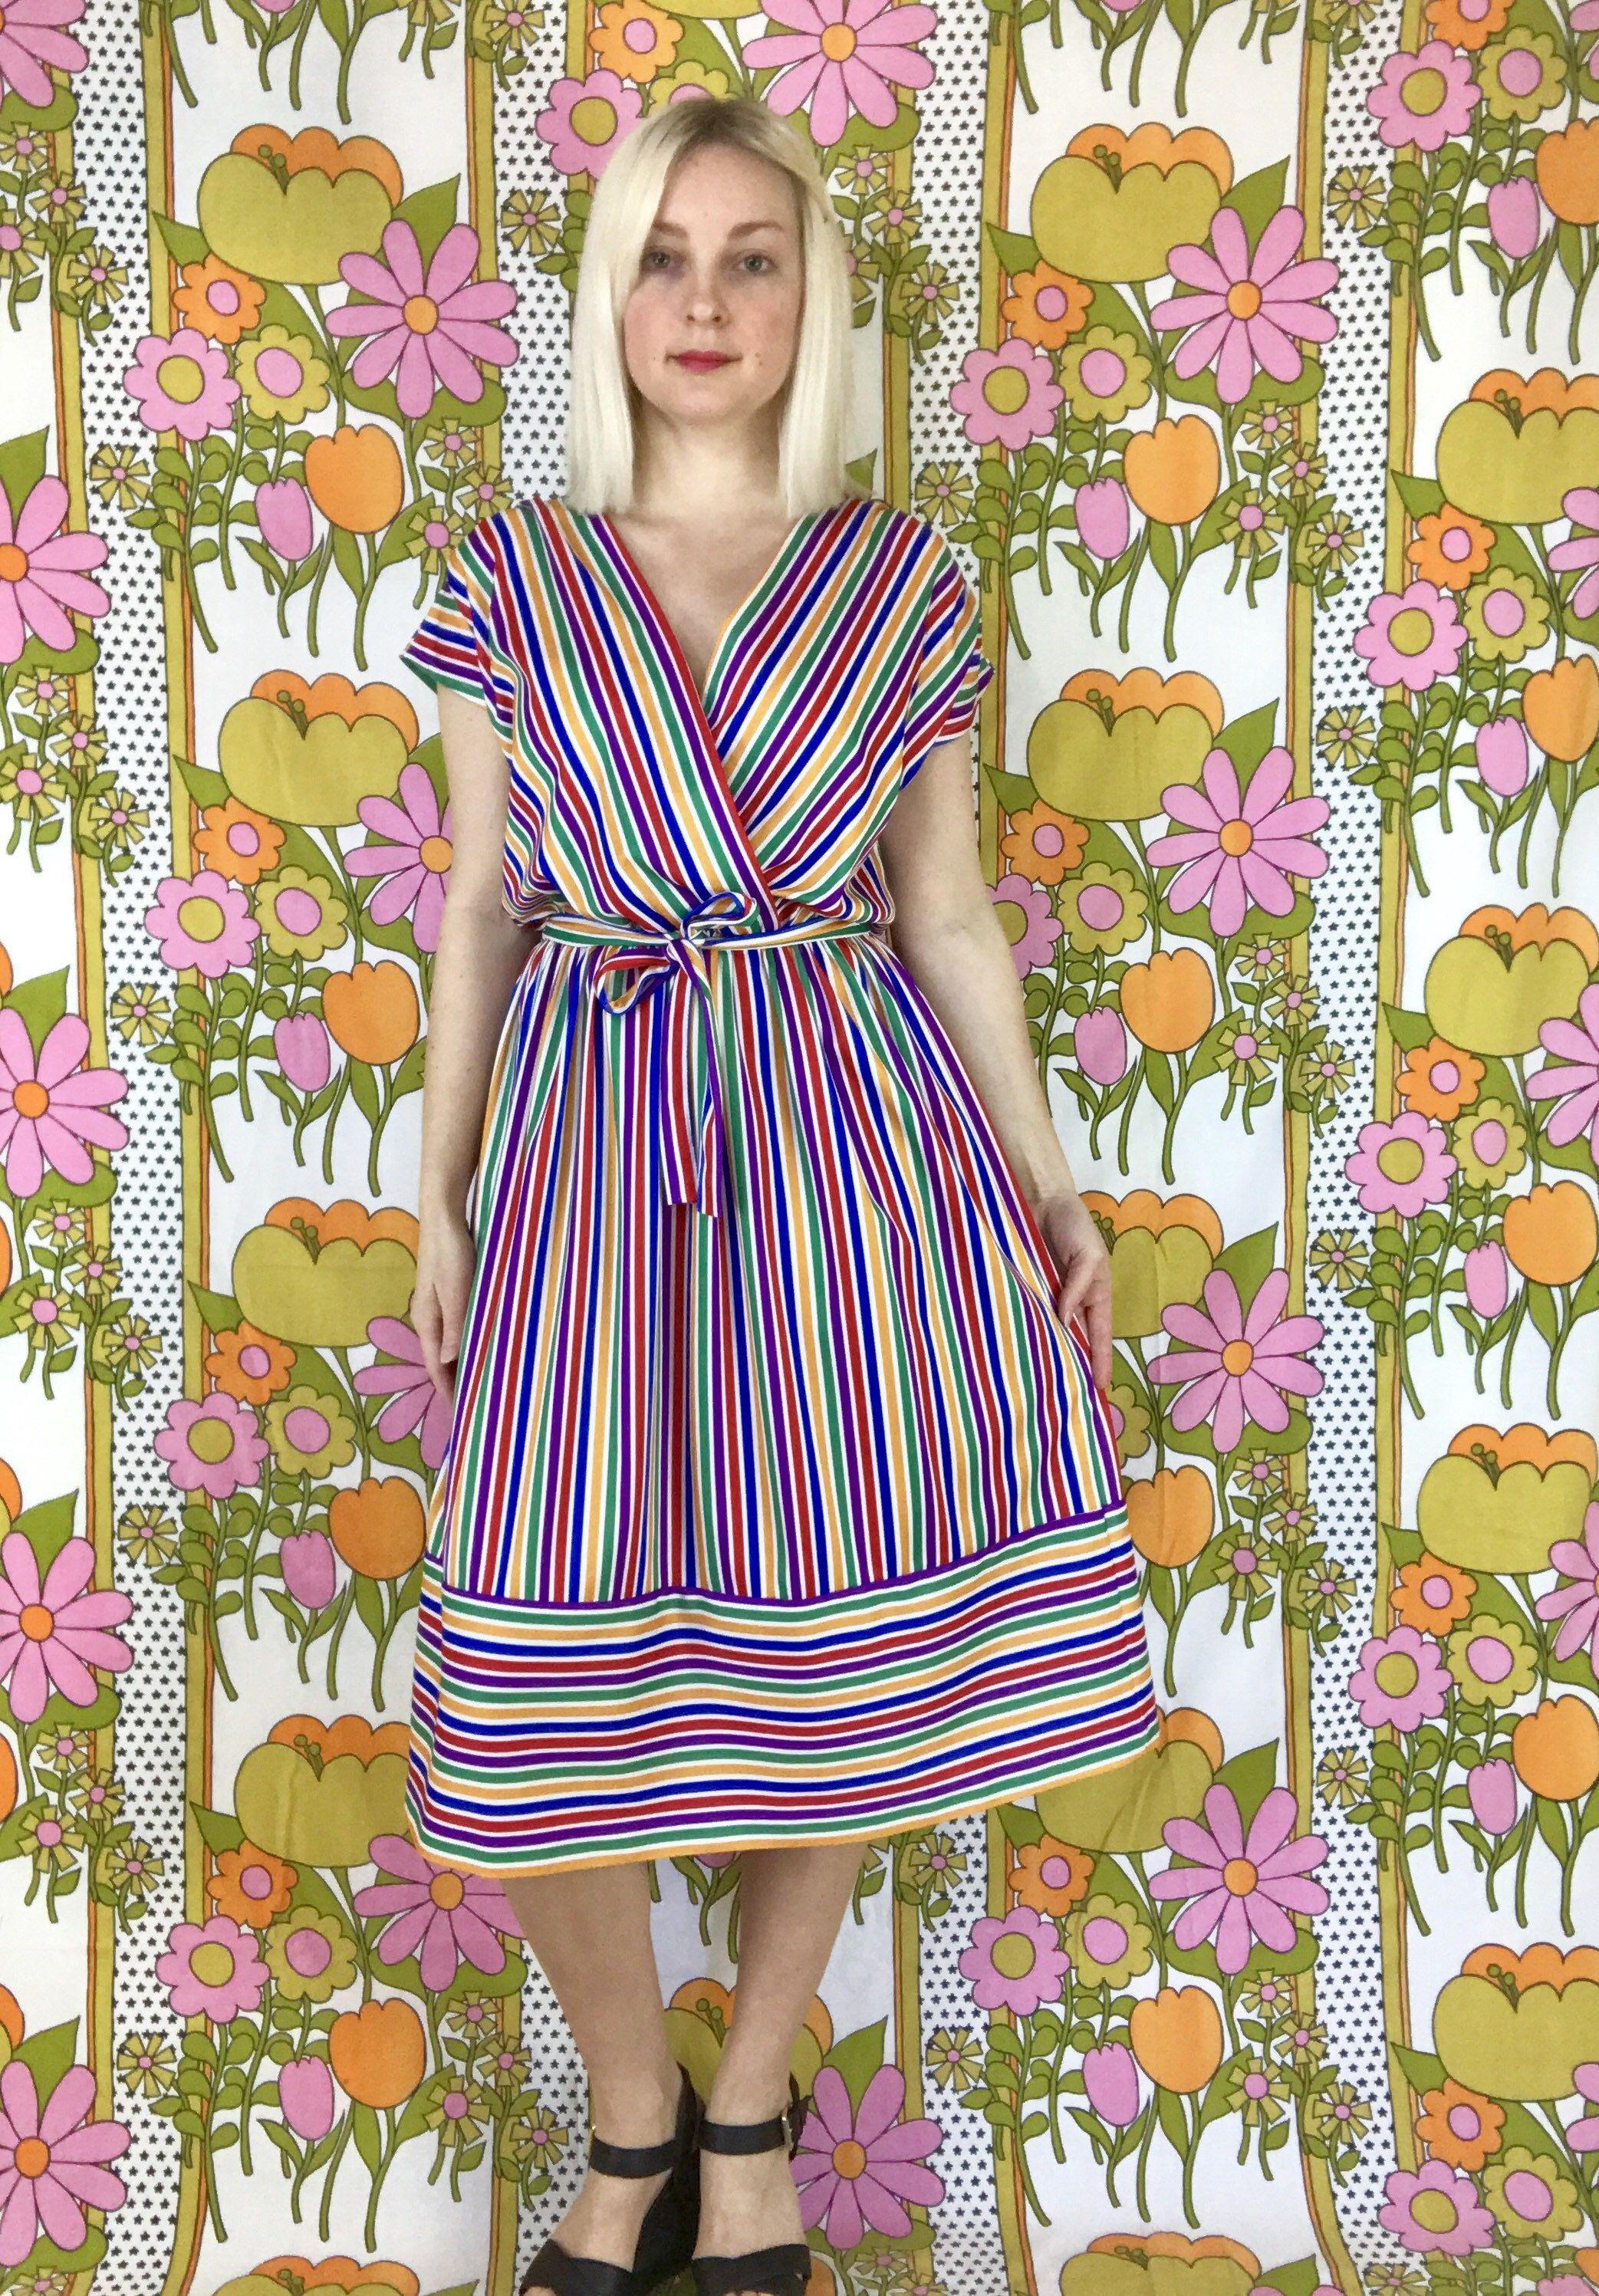 1970s Striped Rainbow Dress Vintage Wrap Dress Mock Wrap Plunging Deep V Neckline Cap Sleeve Belted Midi Dress Retro 70s R 70s Fashion Rainbow Dress Dresses [ 2994 x 2085 Pixel ]